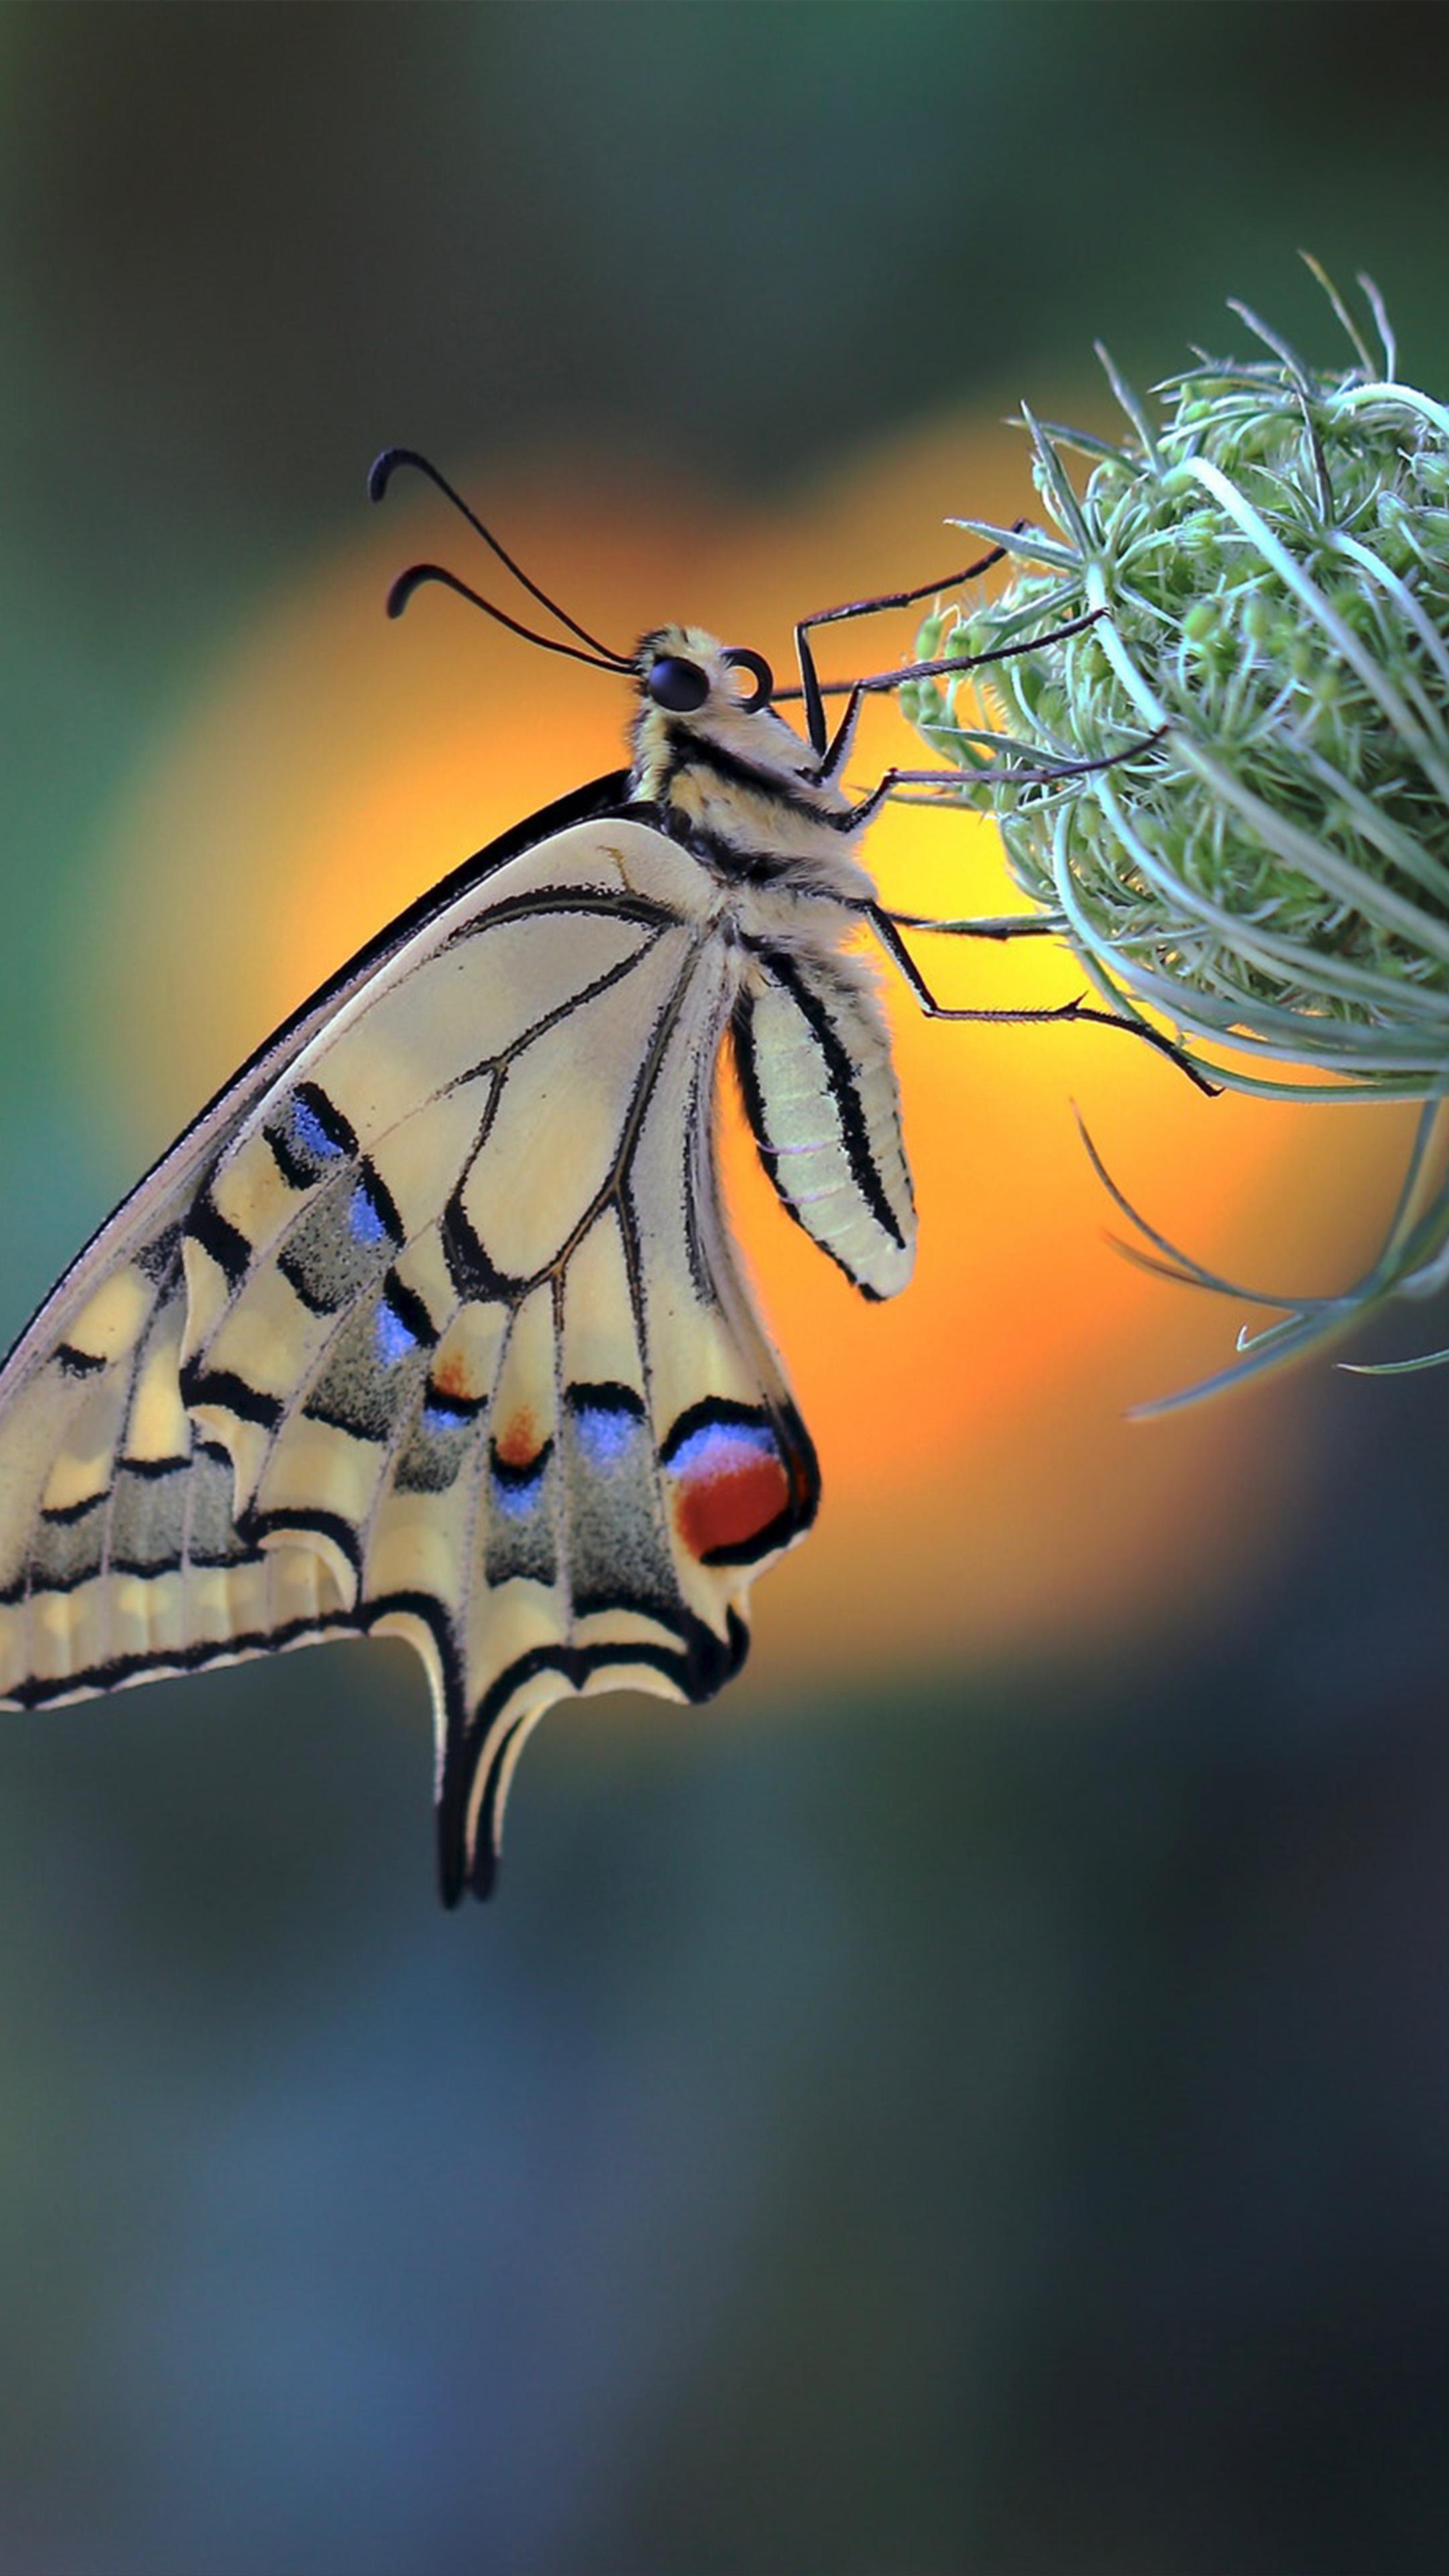 Butterfly Insect Flower Macro 4k Ultra Hd Mobile Wallpaper